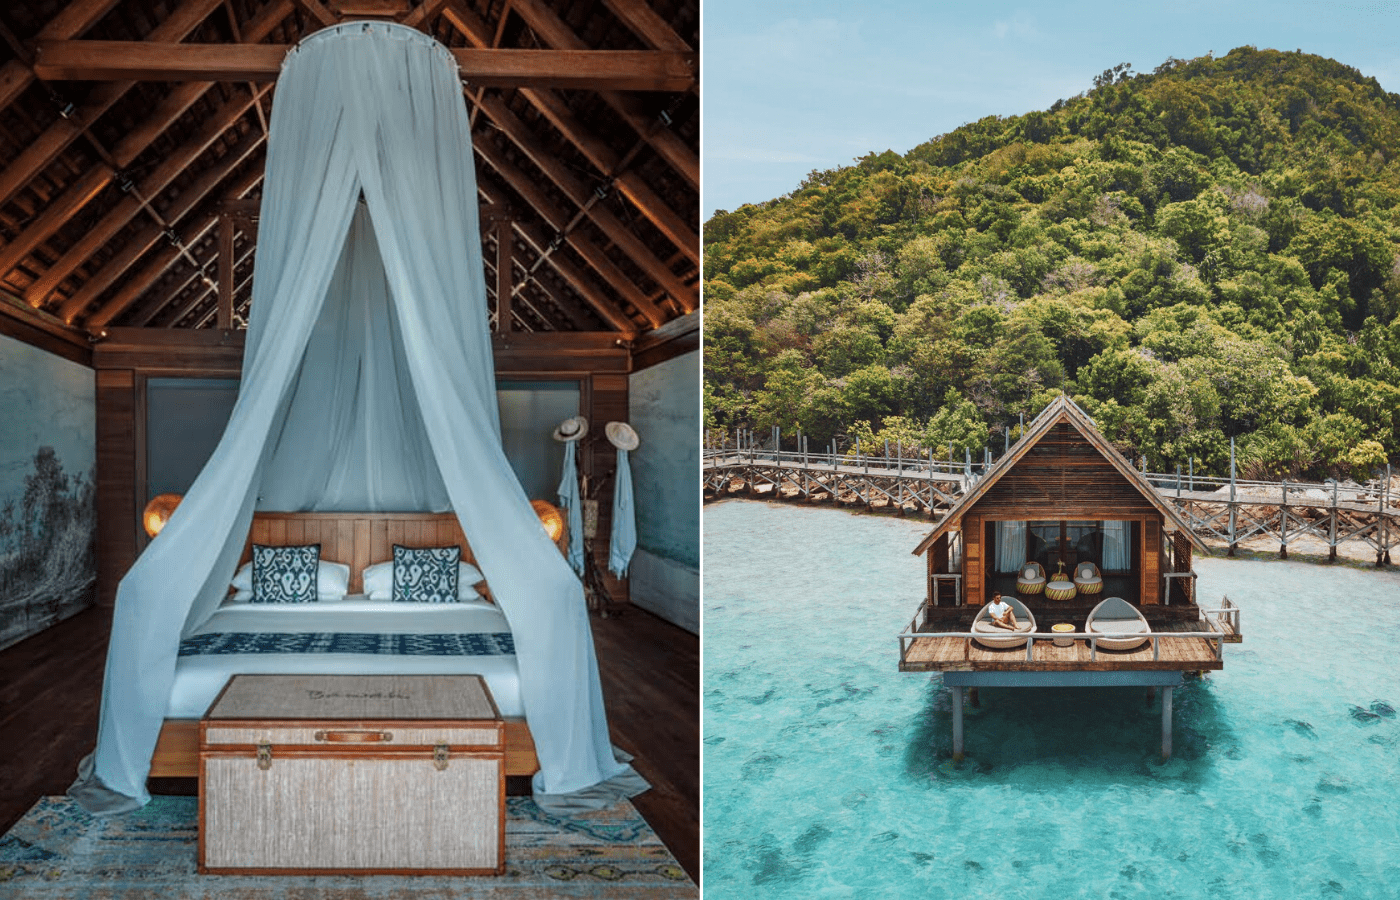 bawah island   private island resorts in Southeast Asia